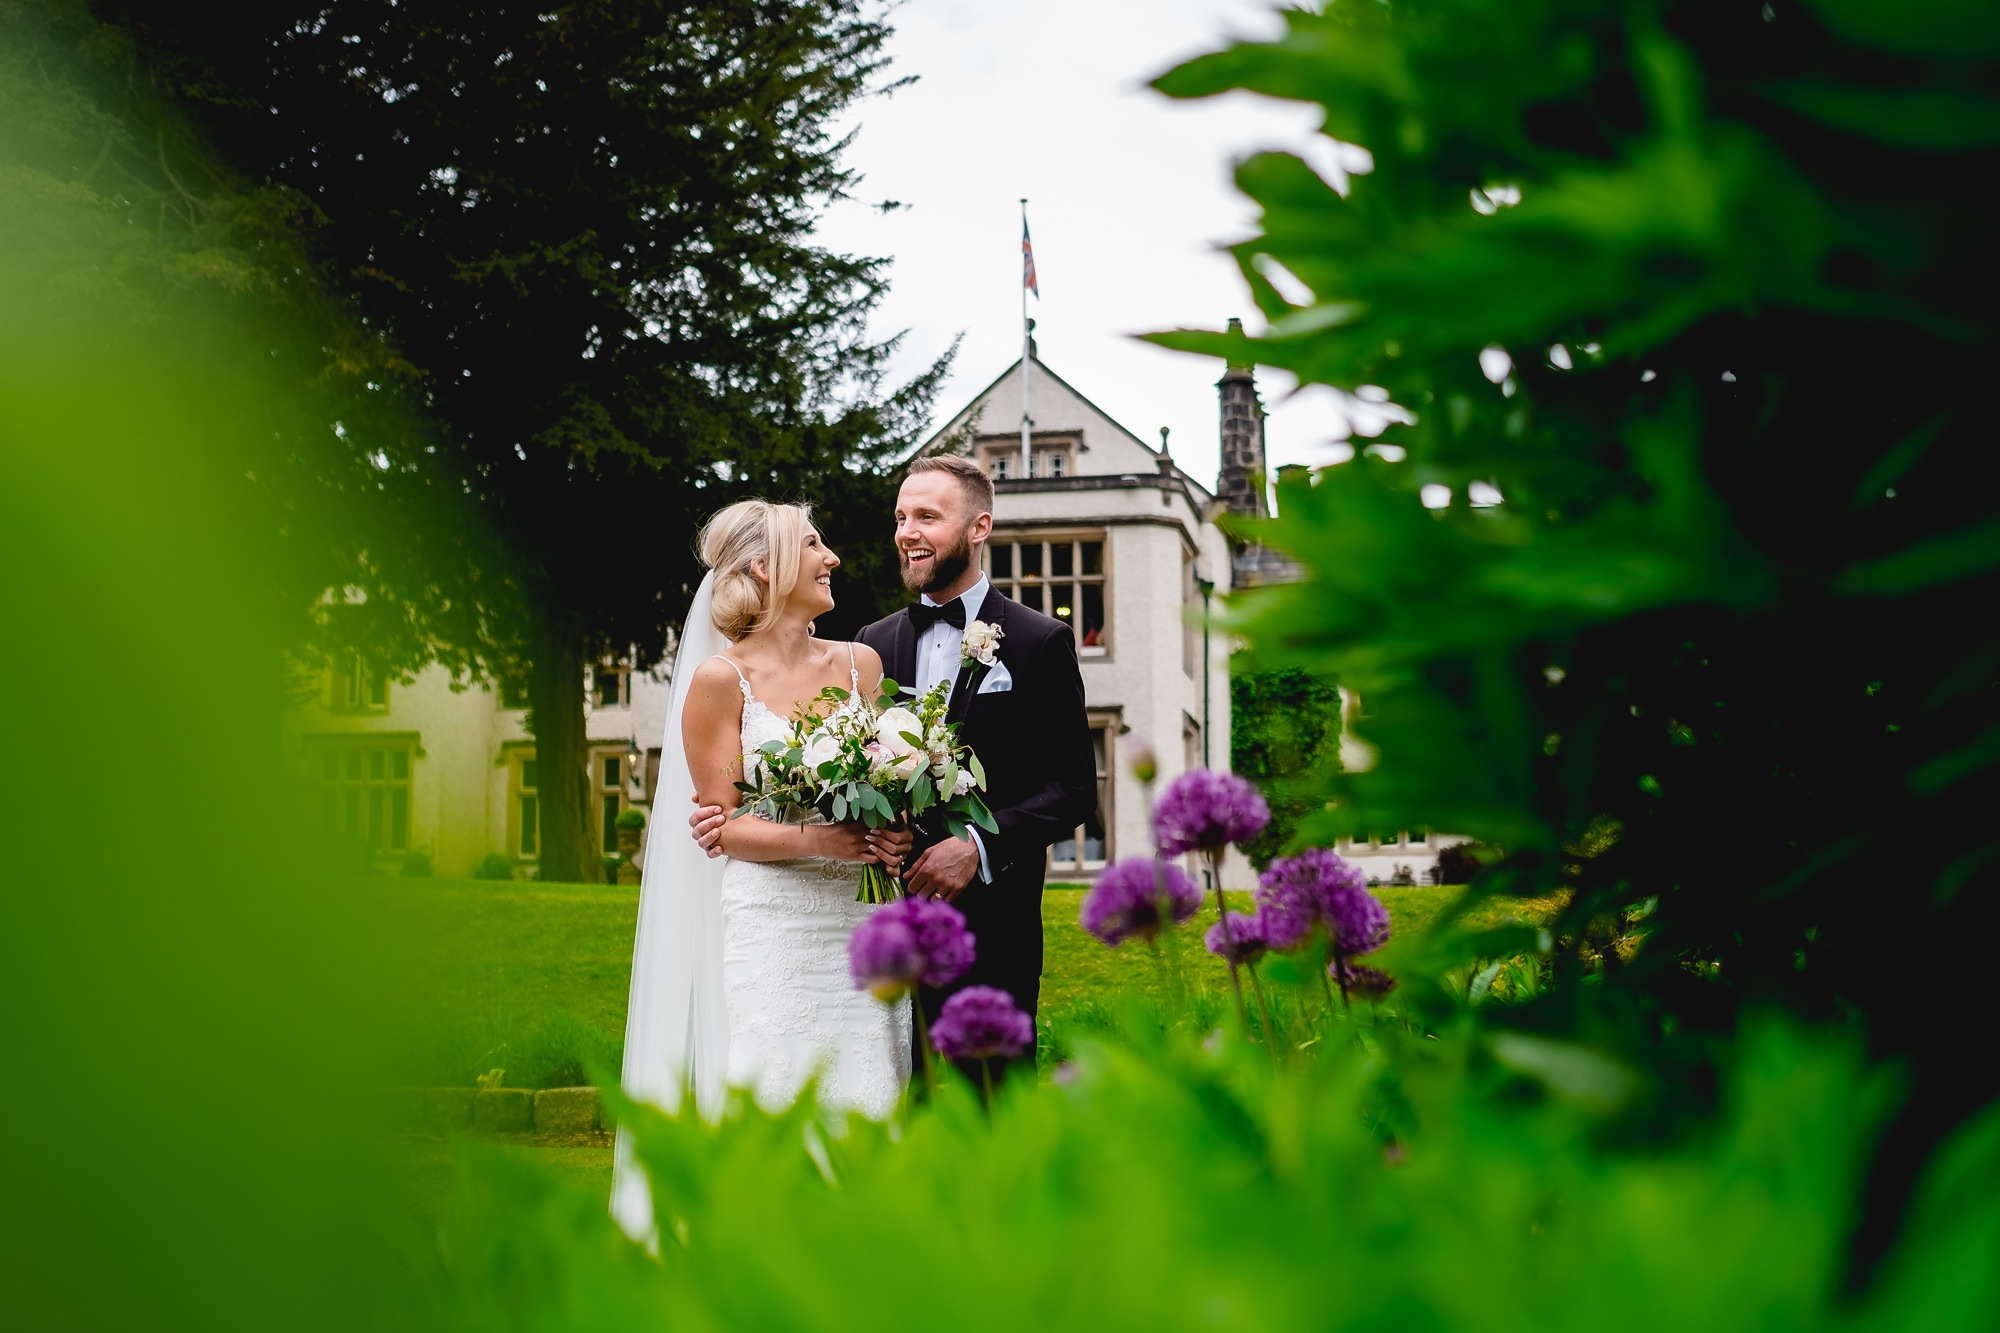 Mitton-Hall-Wedding-Photographer_0016.jpg